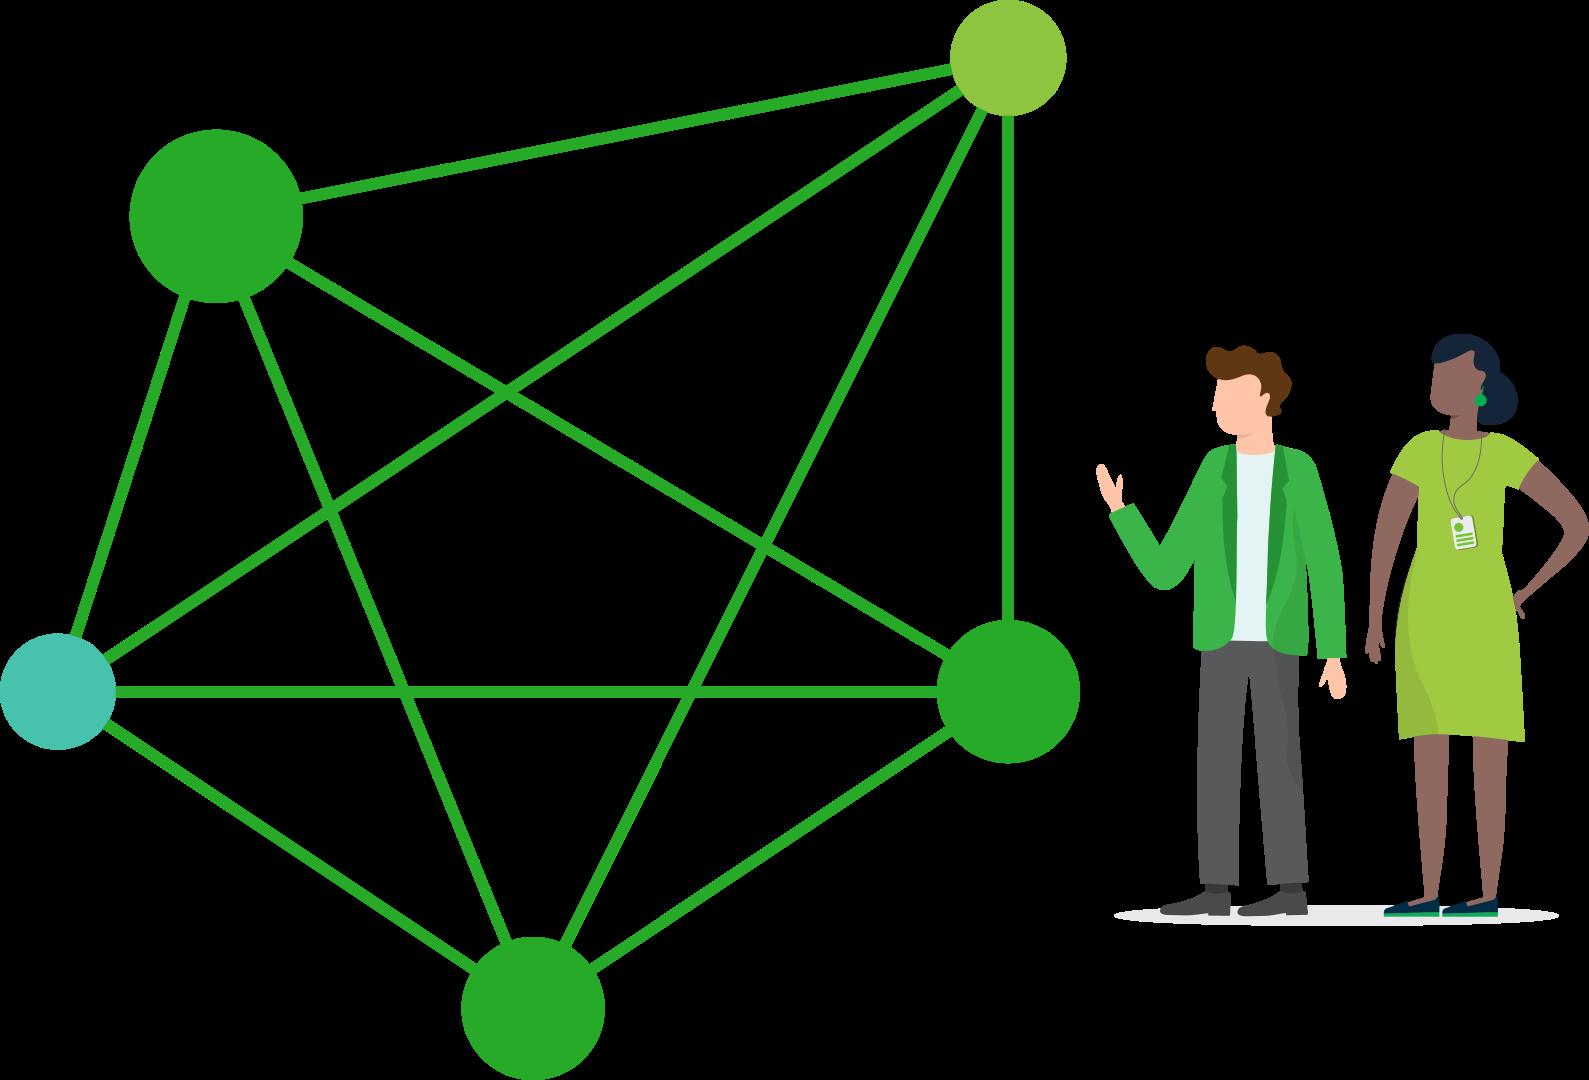 Self-healing Edge Mesh network